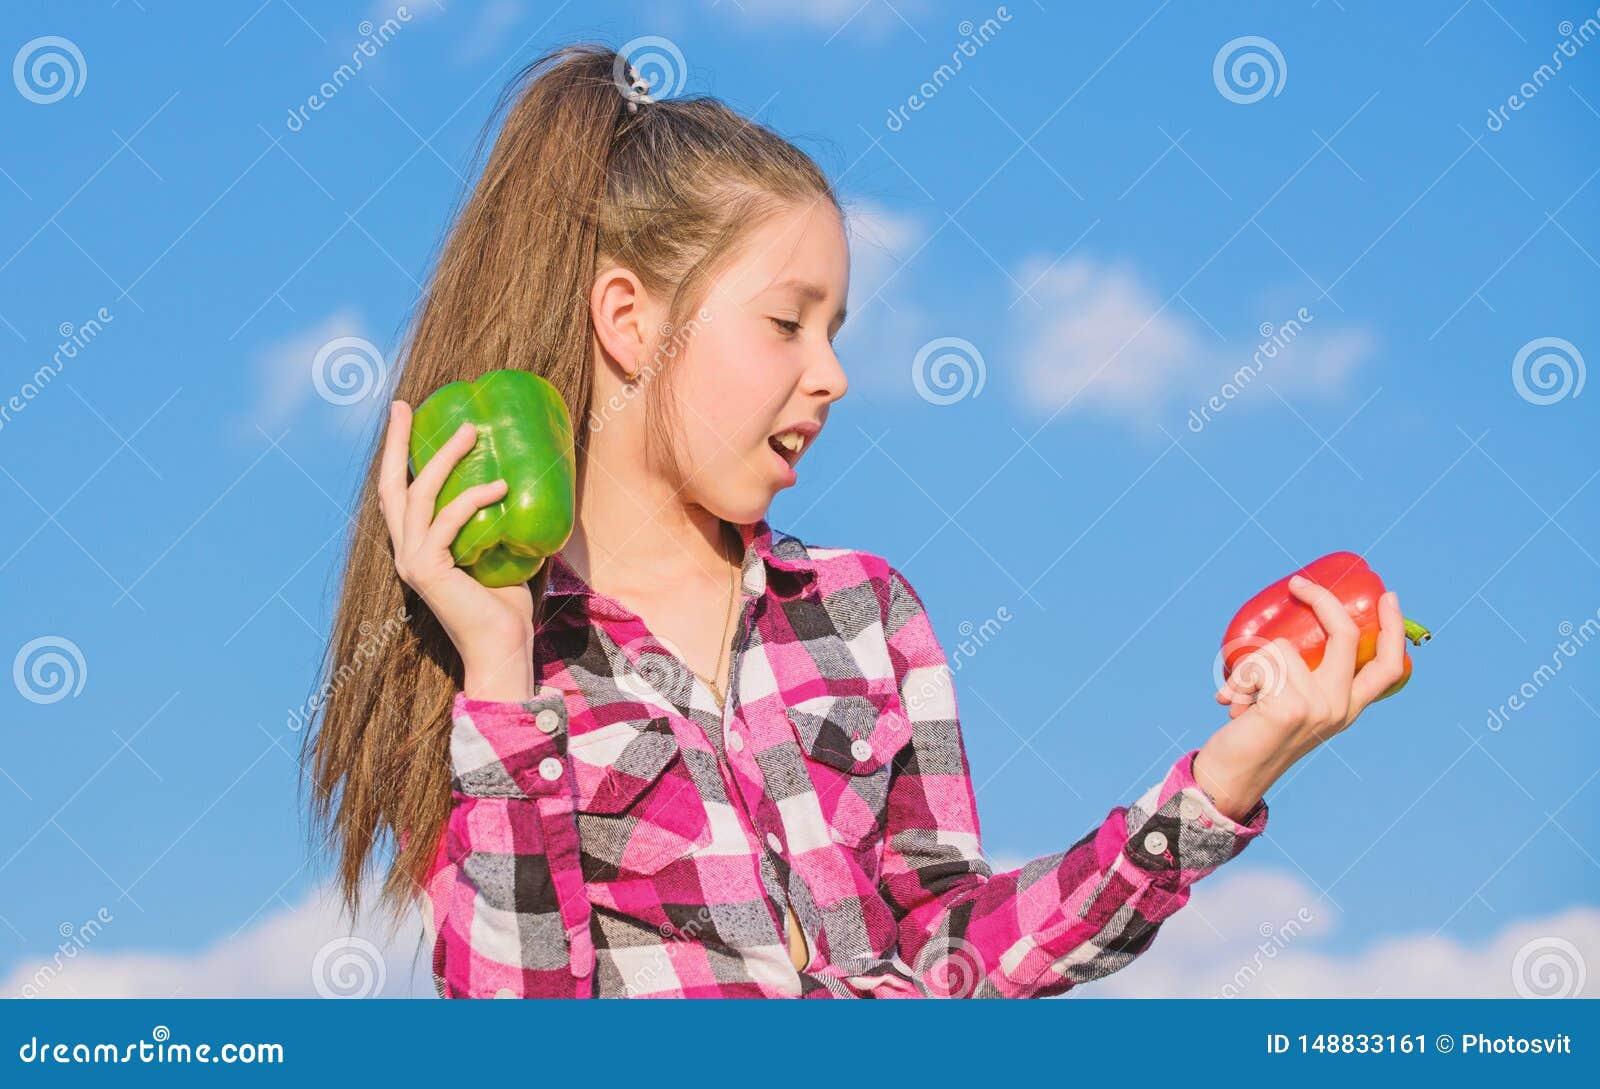 Homegrown λαχανικά συγκομιδών πτώσης Χορτοφάγος έννοια Ποιο πιπέρι εσείς θα επέλεγε Κόκκινα και πράσινα πιπέρια λαβής κοριτσιών π